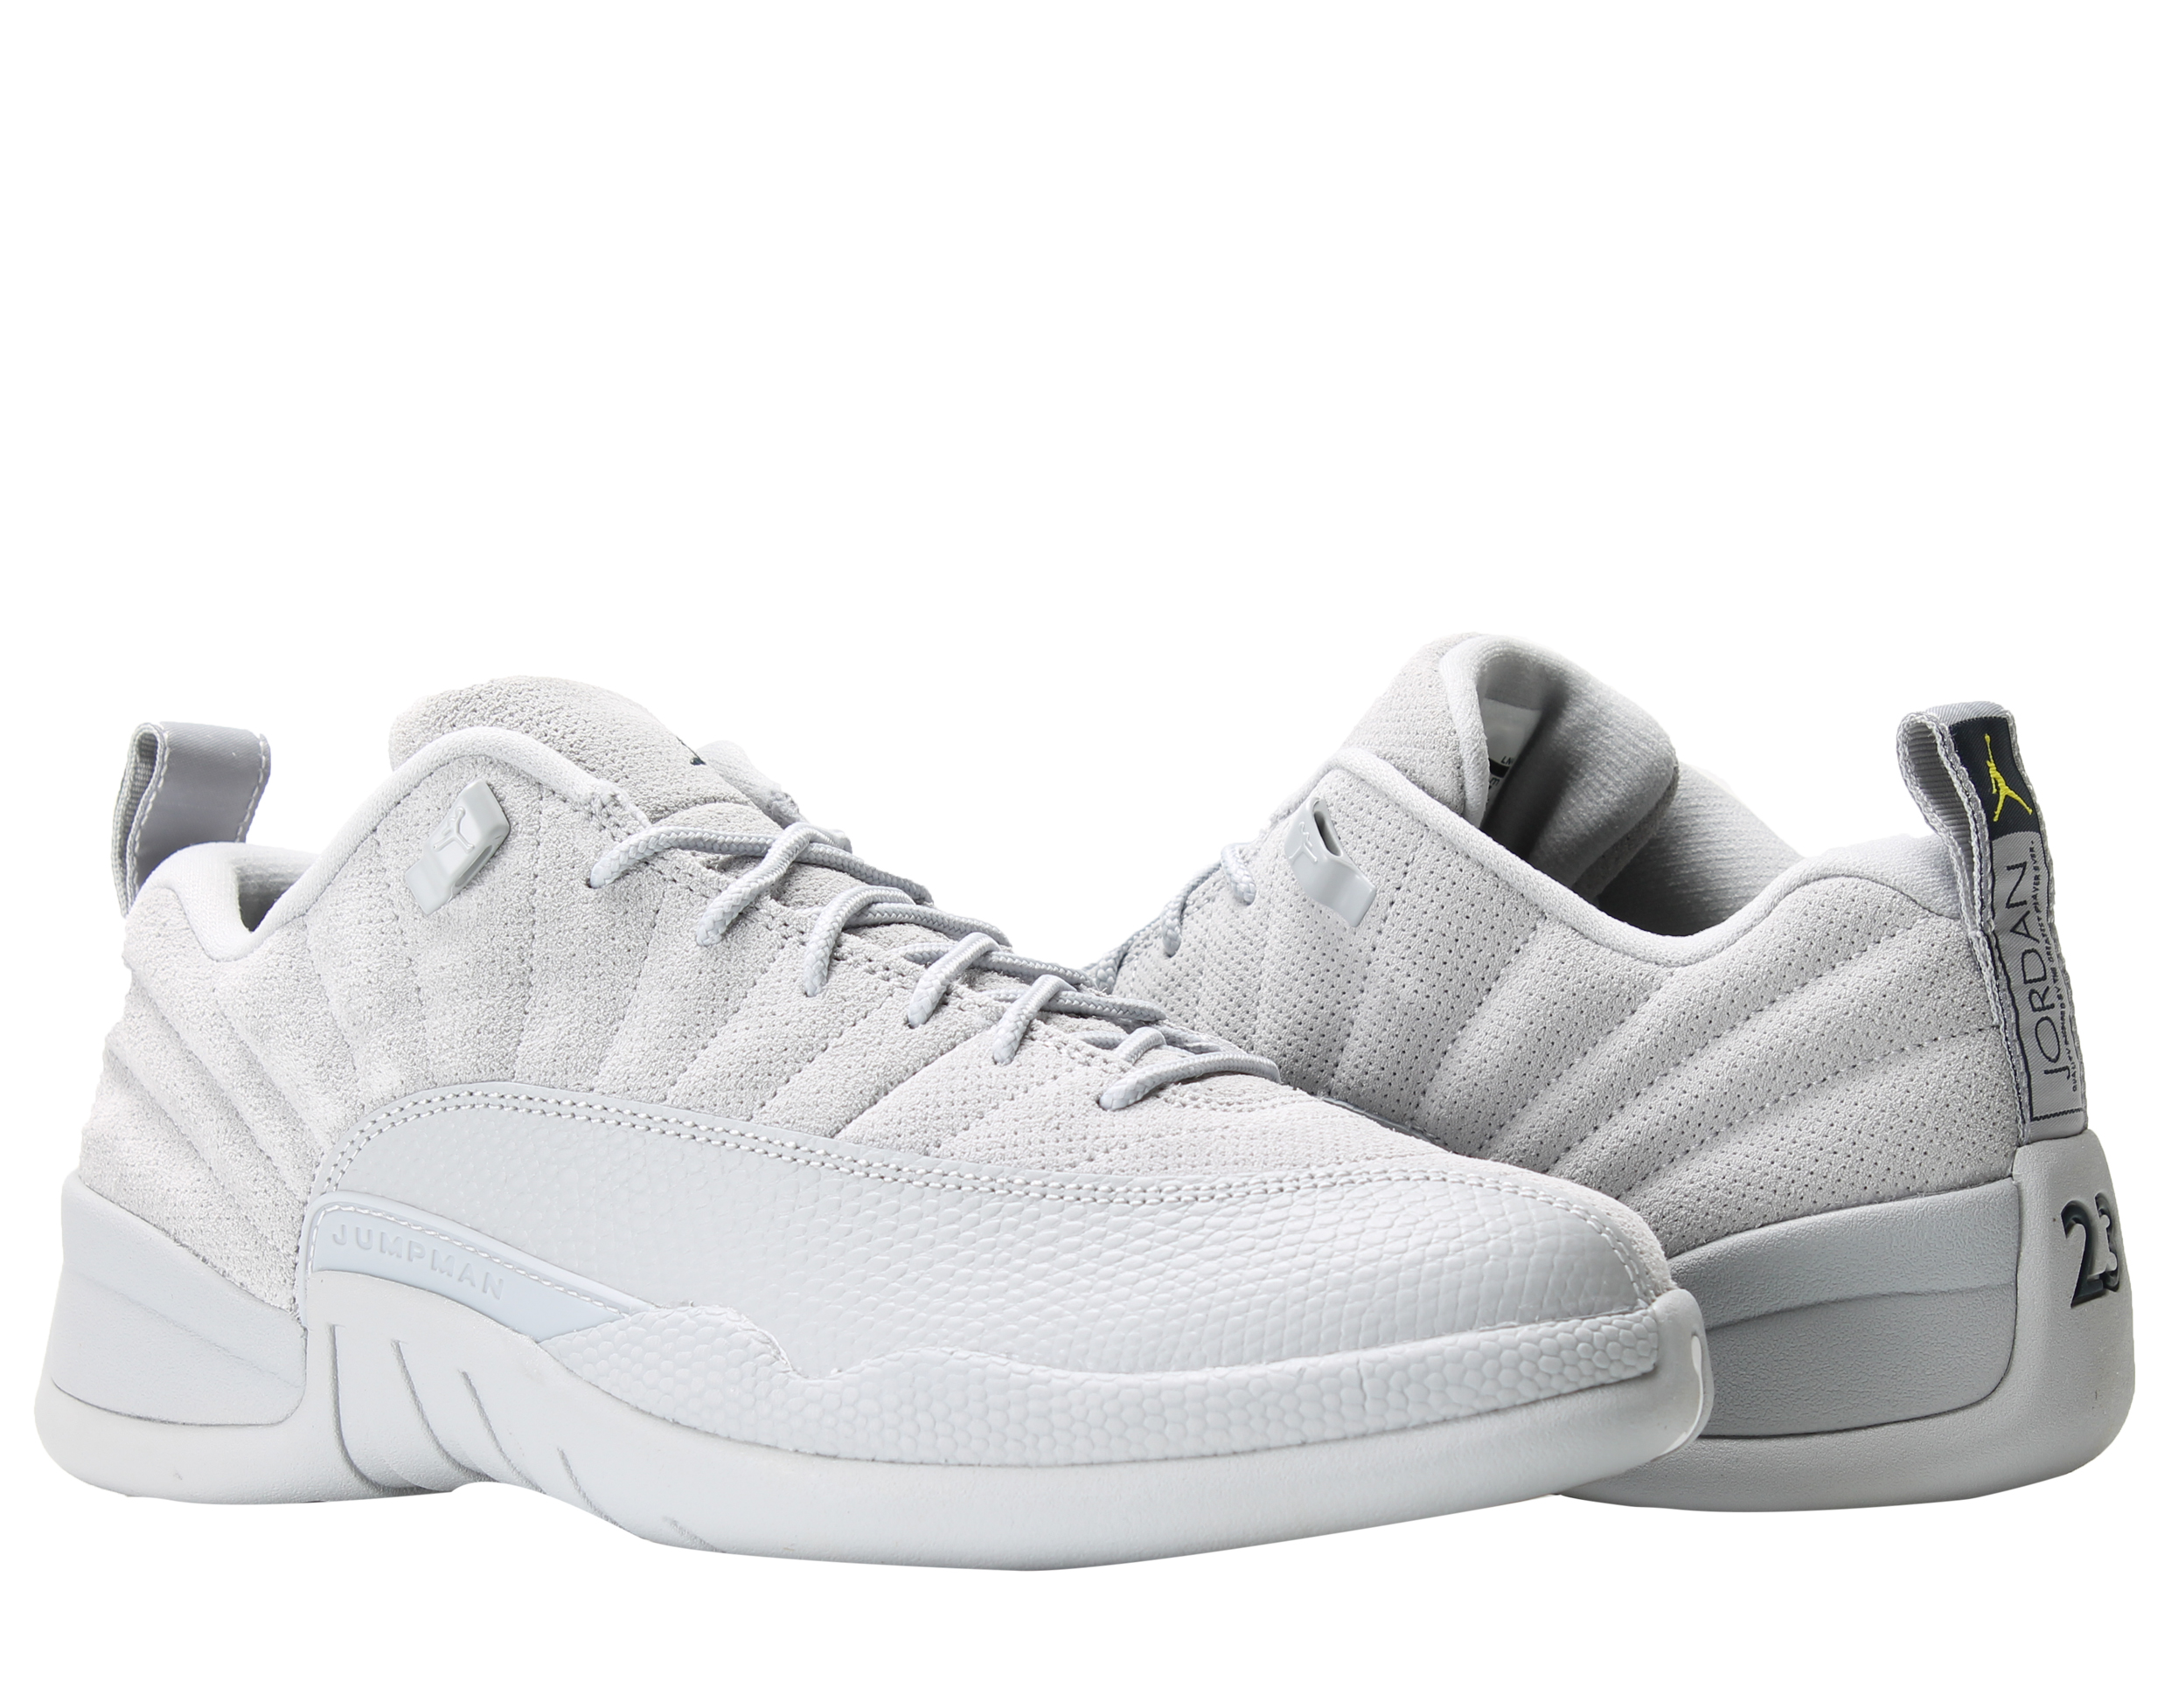 Nike Air Jordan 12 Retro Low Wolf Grey Men's Basketball Shoes 308317-002 Size 8 by Jordan